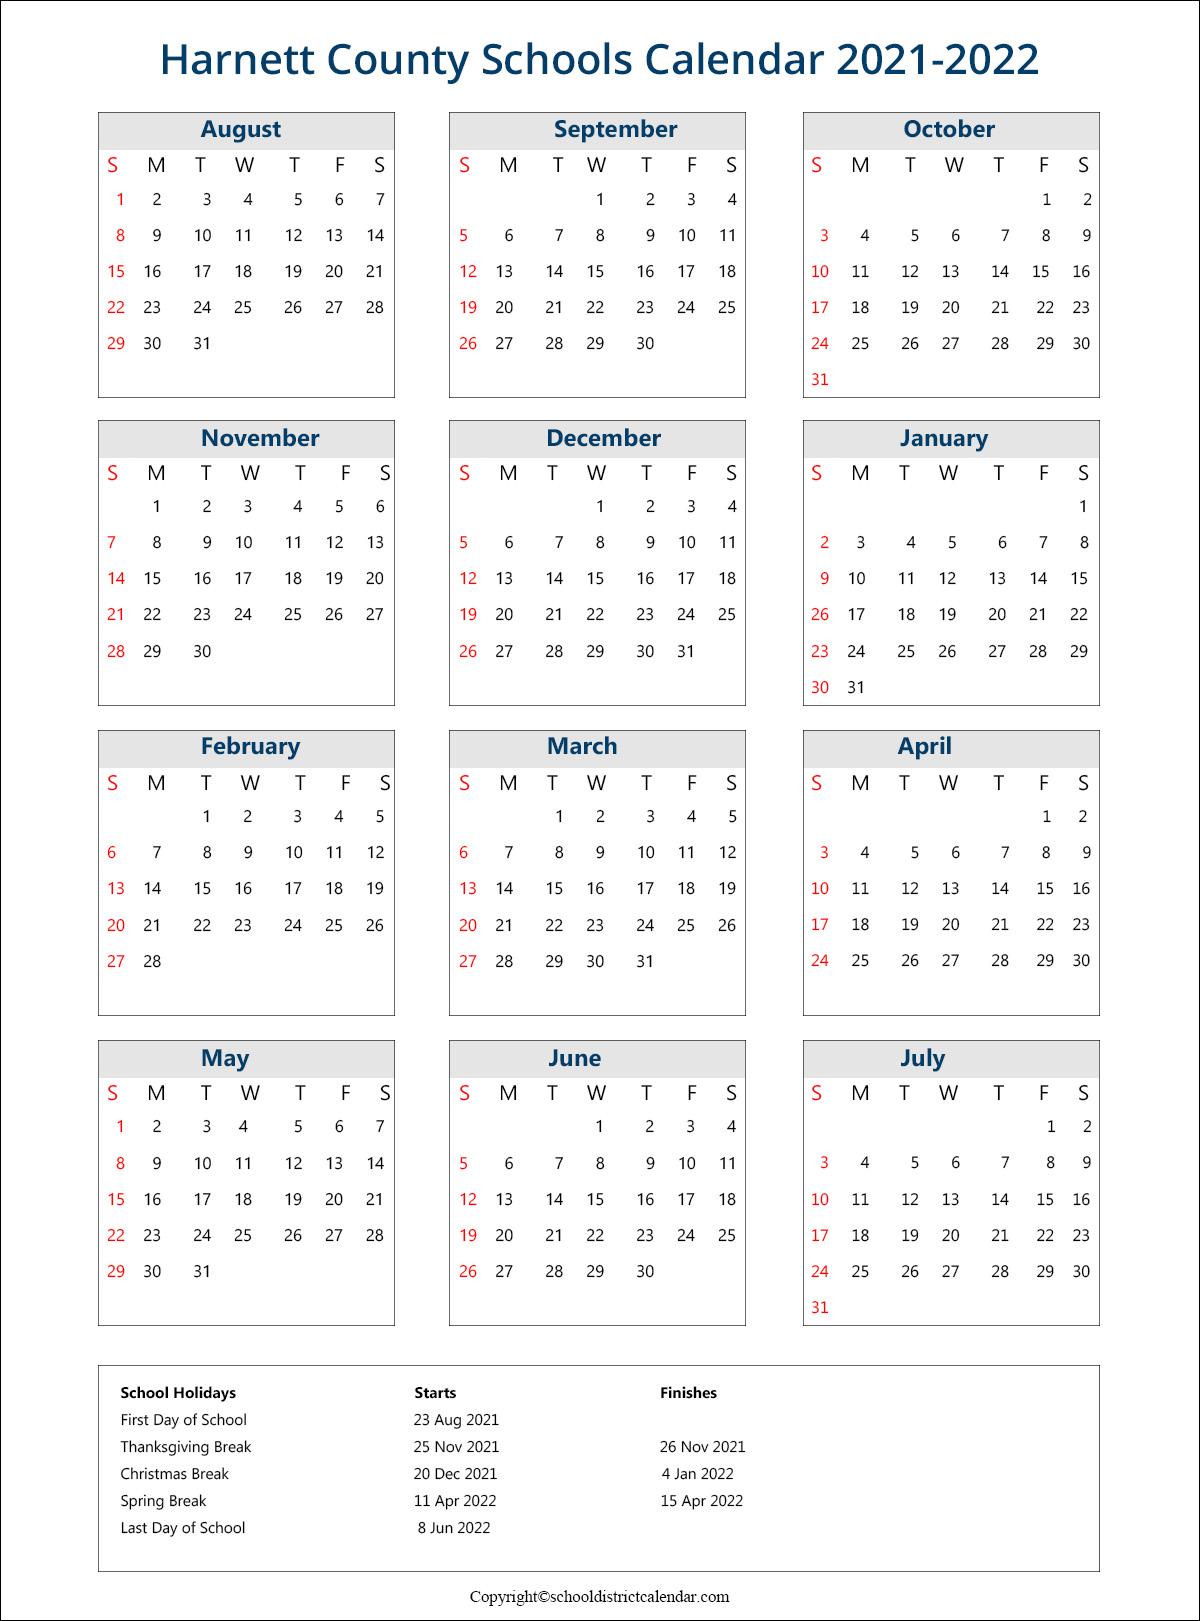 Harnett County Schools Calendar, Lillington Holidays 2021